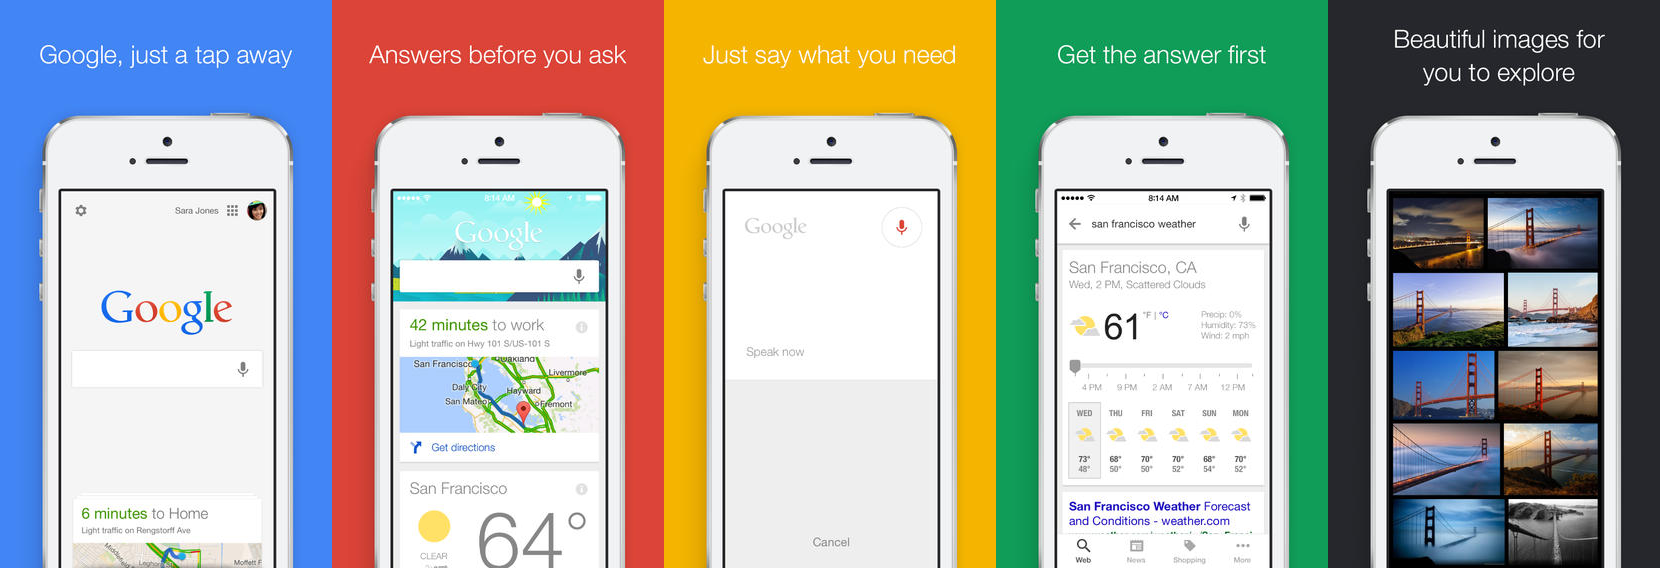 Google Search 4.0.0 für Apple iOS